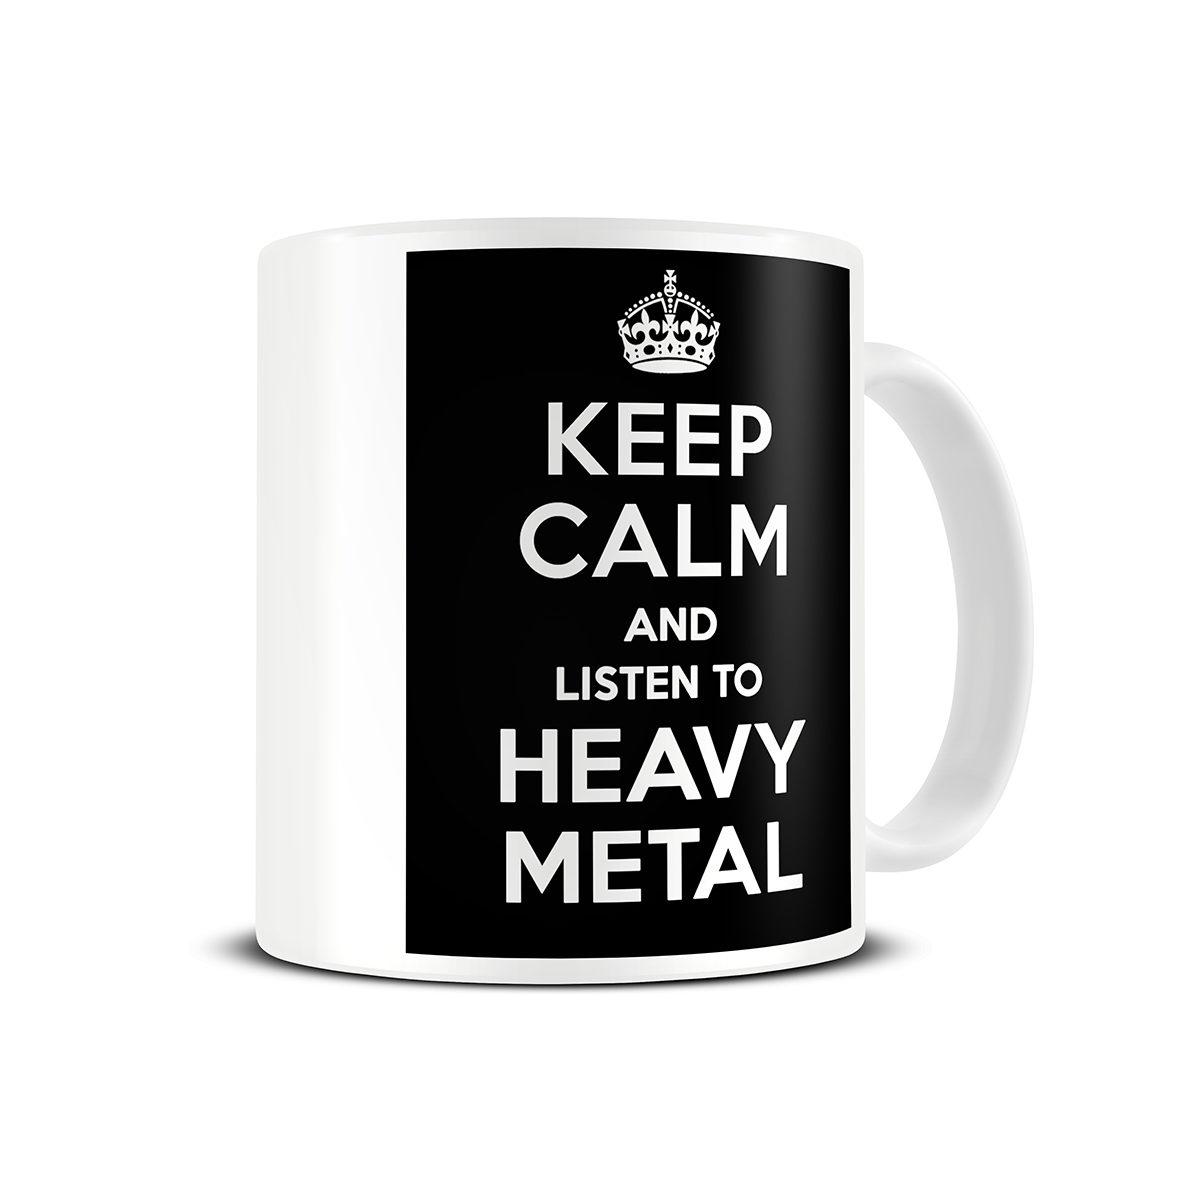 keep-calm-listen-to-heavy-metal-fan-gift-mug